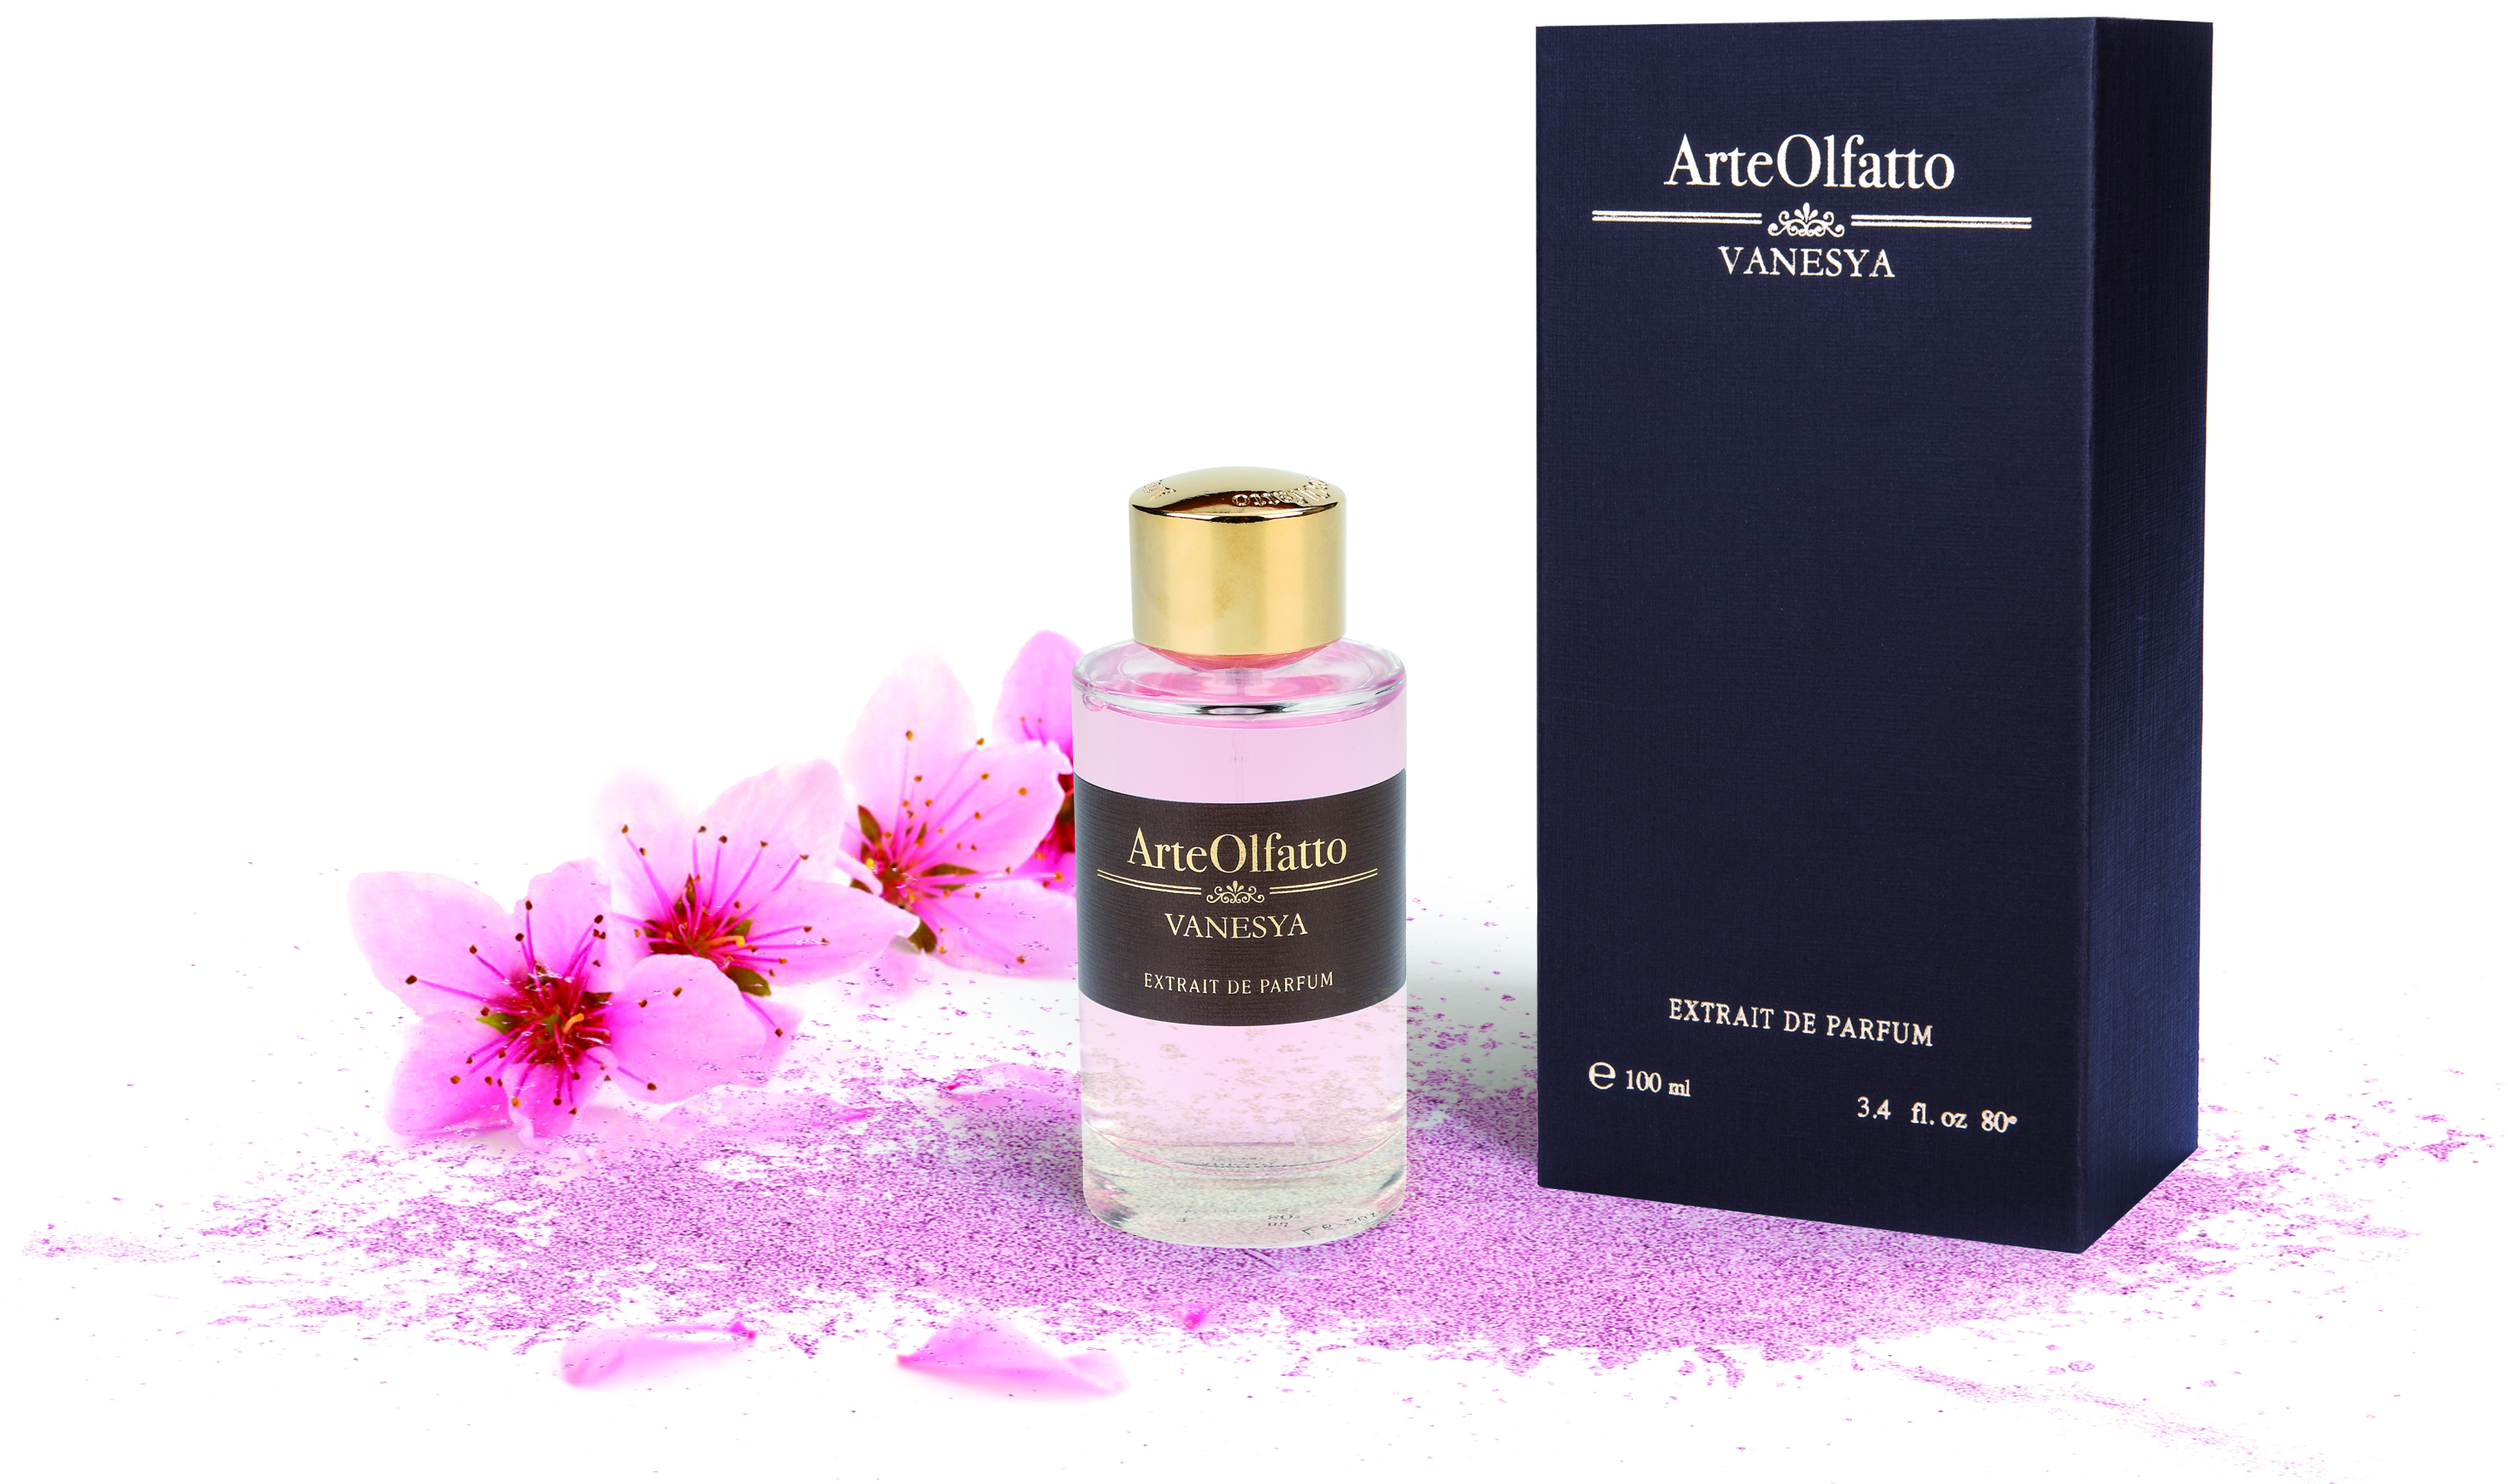 Arte Olfatto Vanesya Extrait De Parfum 100 ml